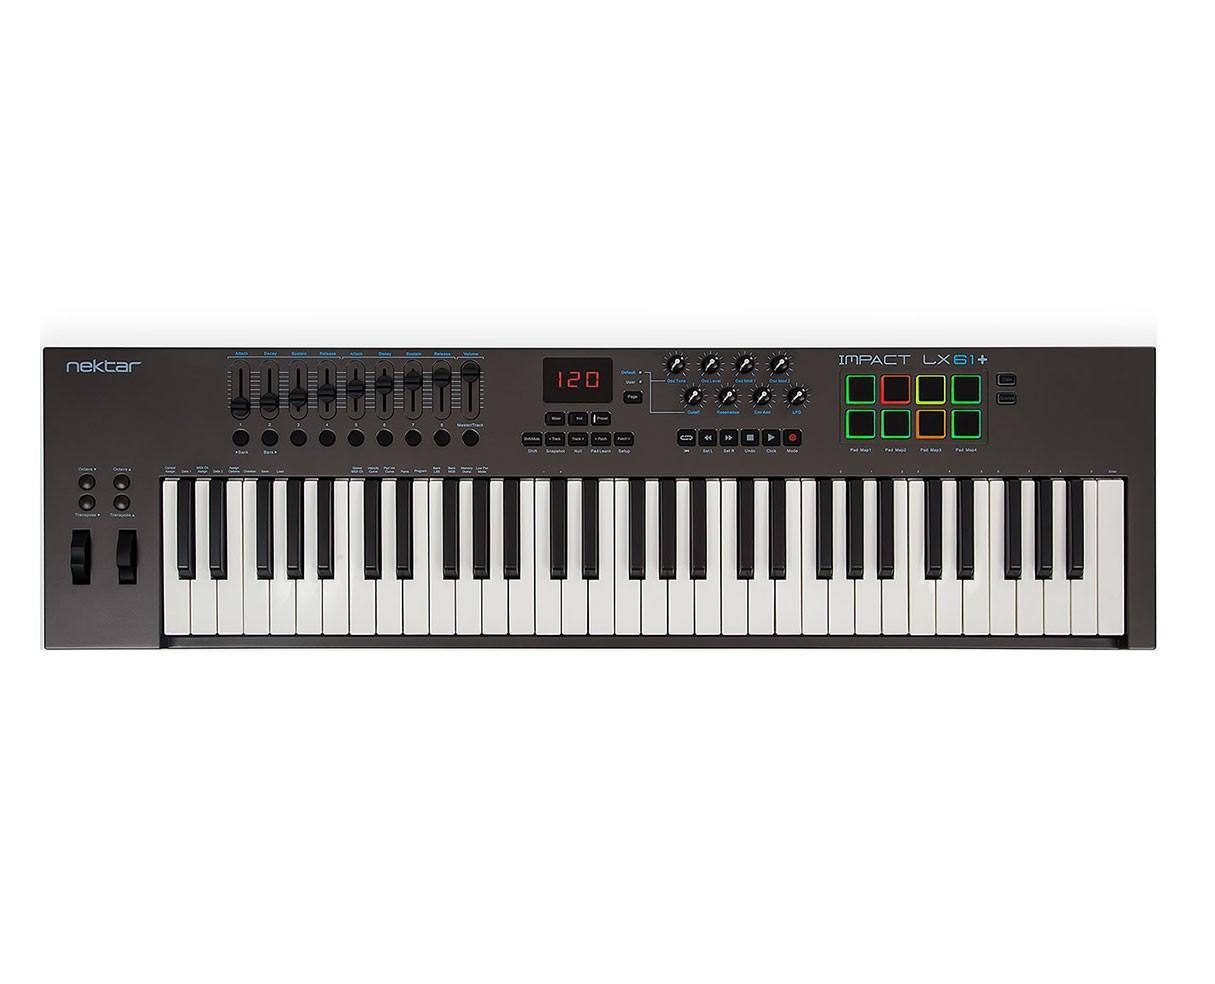 Nektar Impact LX61+ 61 Key Keyboard MIDI controller with built in DAW integration (Open Box)